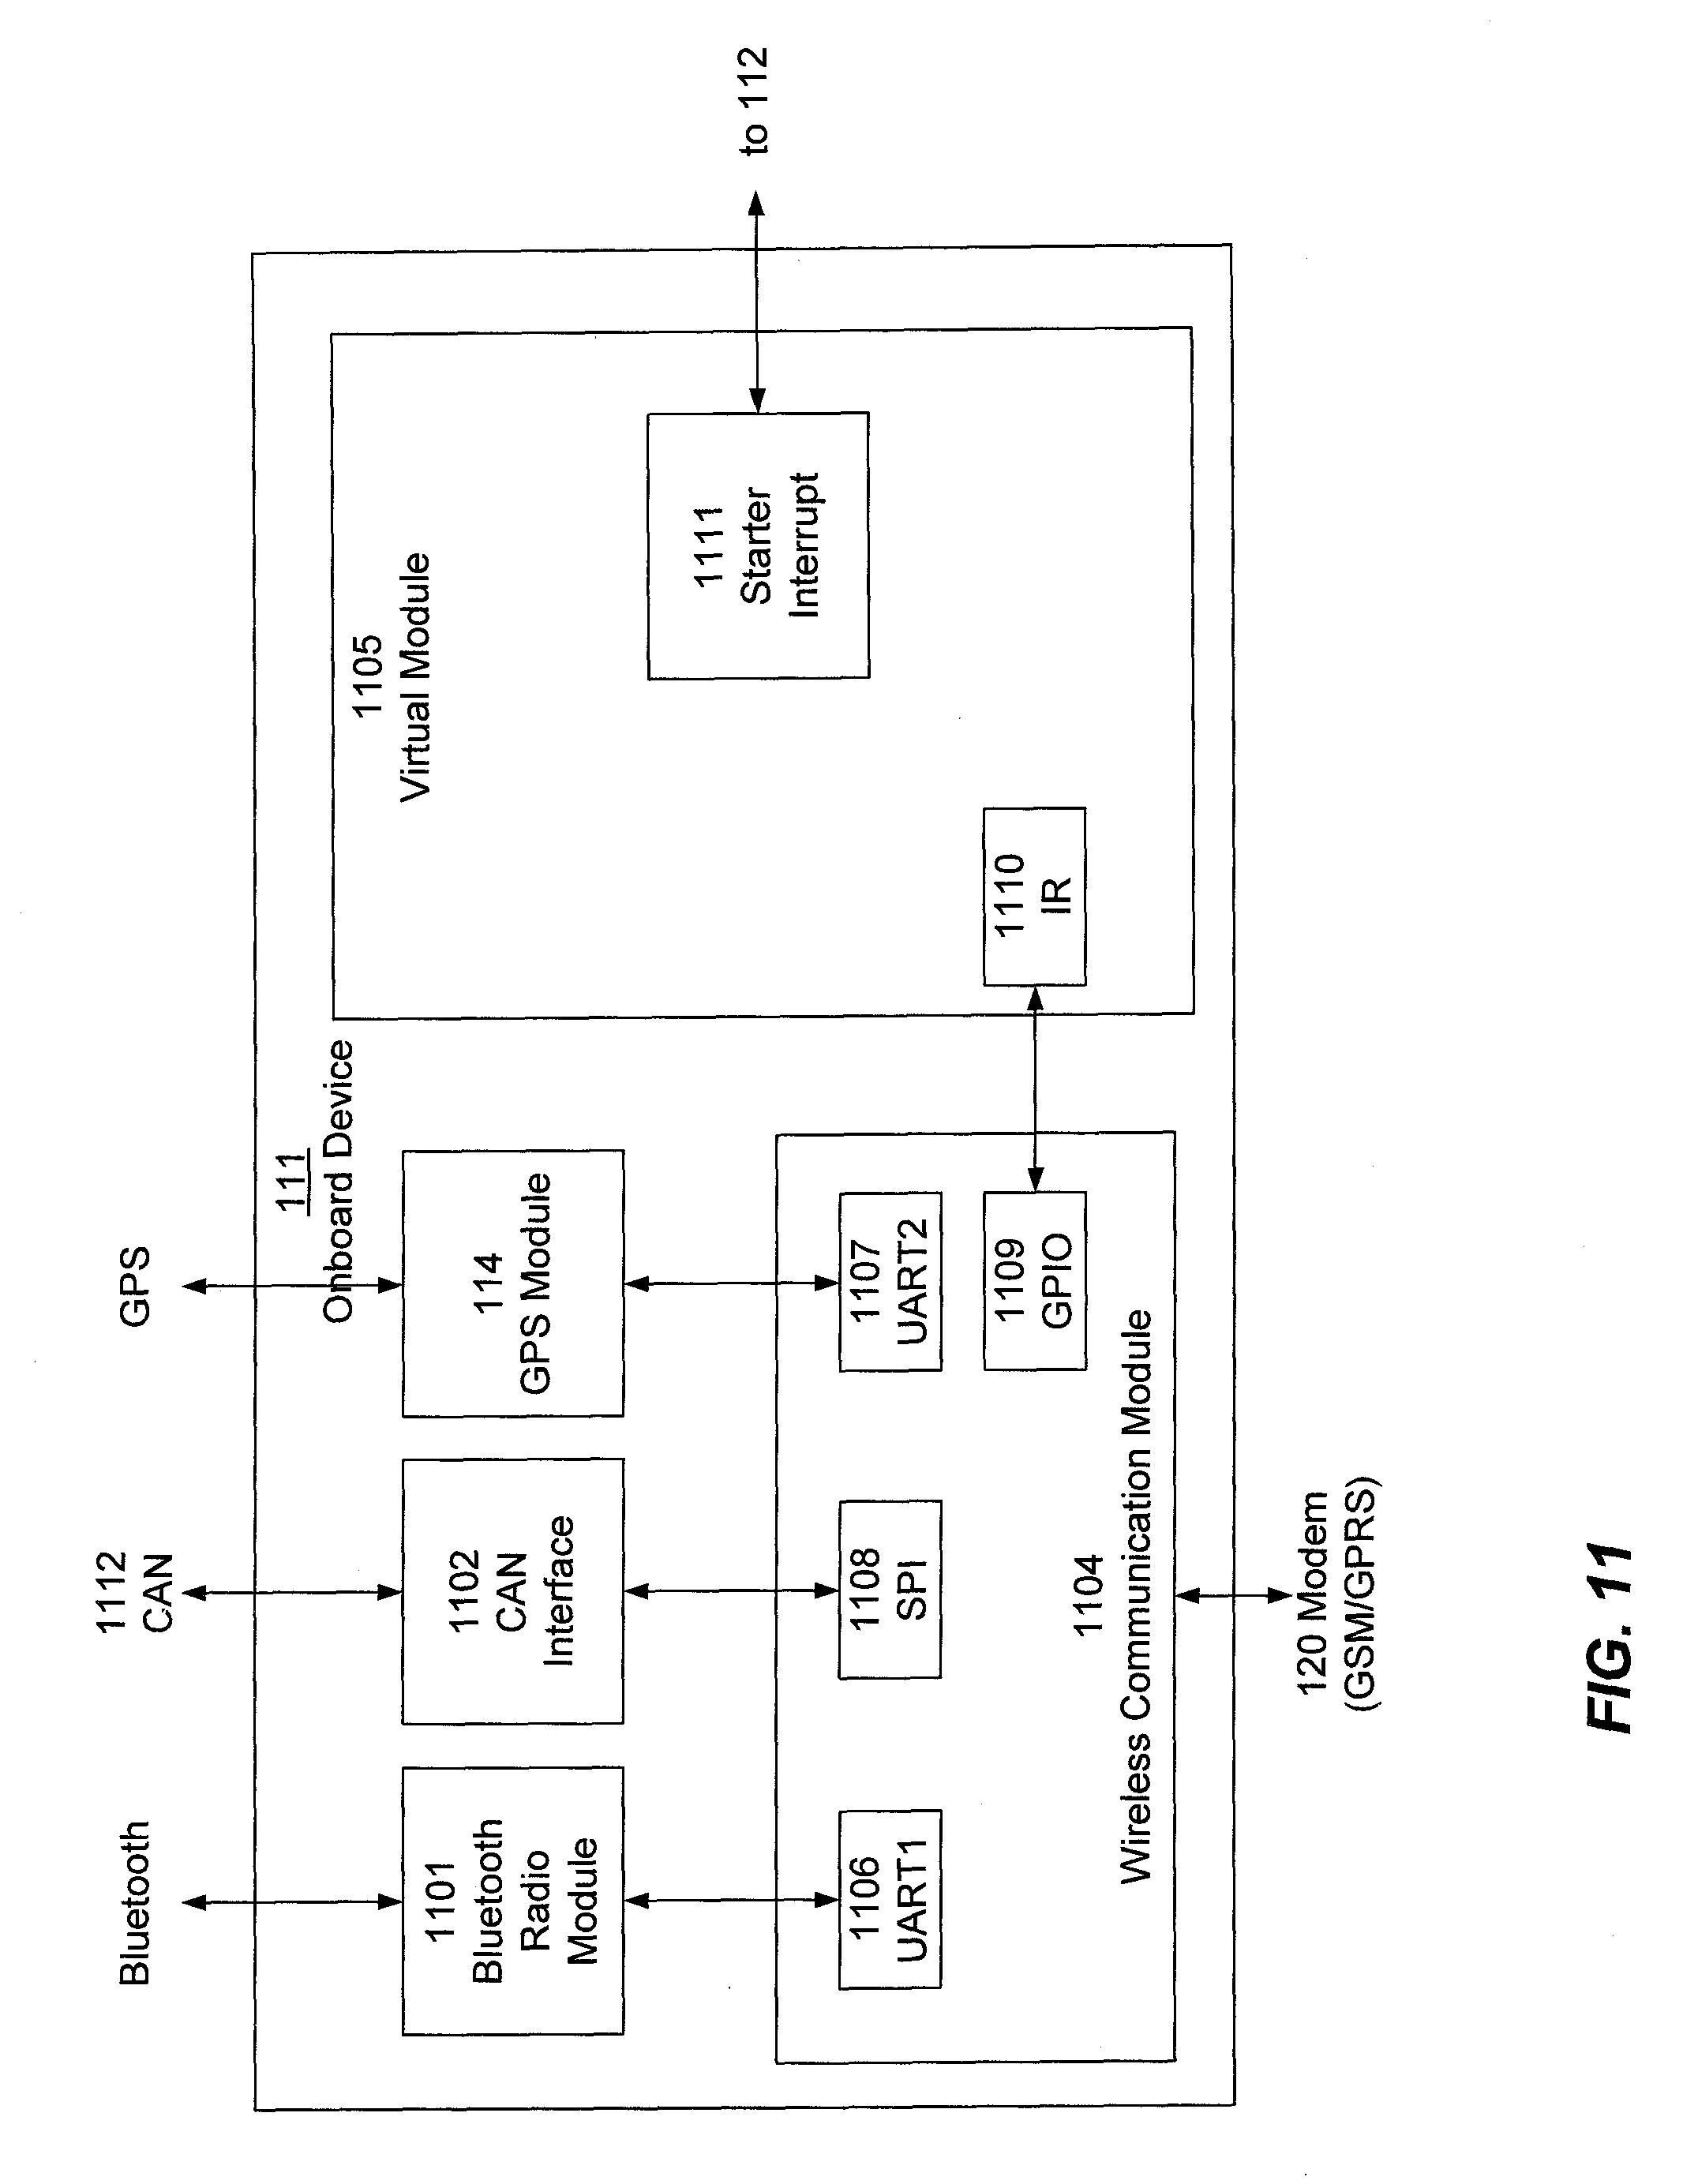 passtime pte 2 wiring diagram Download-Fresh Passtime Gps Wiring Diagram 83 In Chevy Starter Throughout 16-k